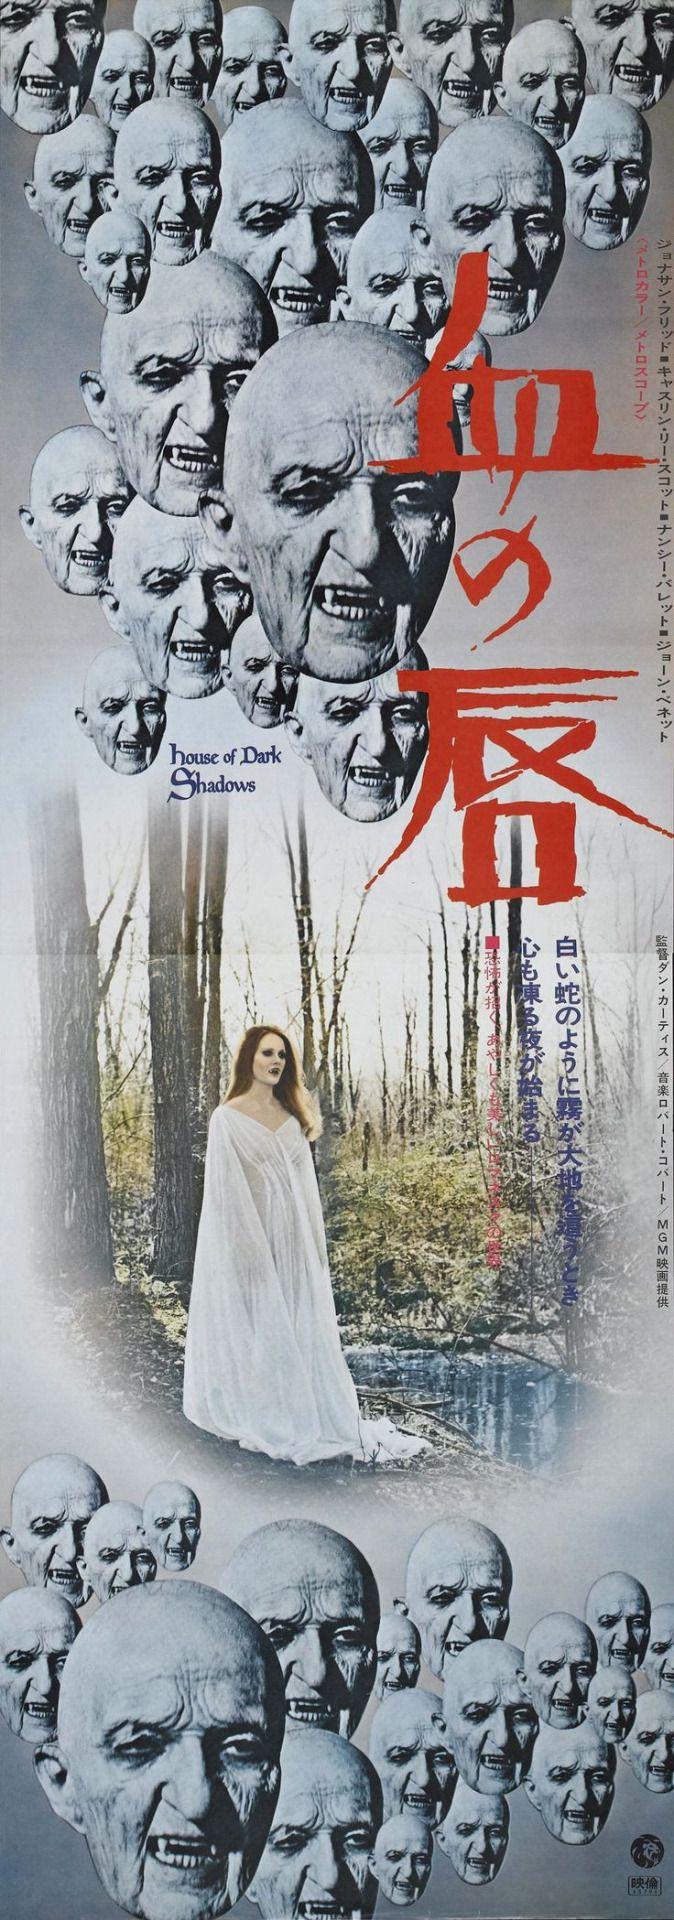 Japanese House Of Dark Shadows poster (1970)